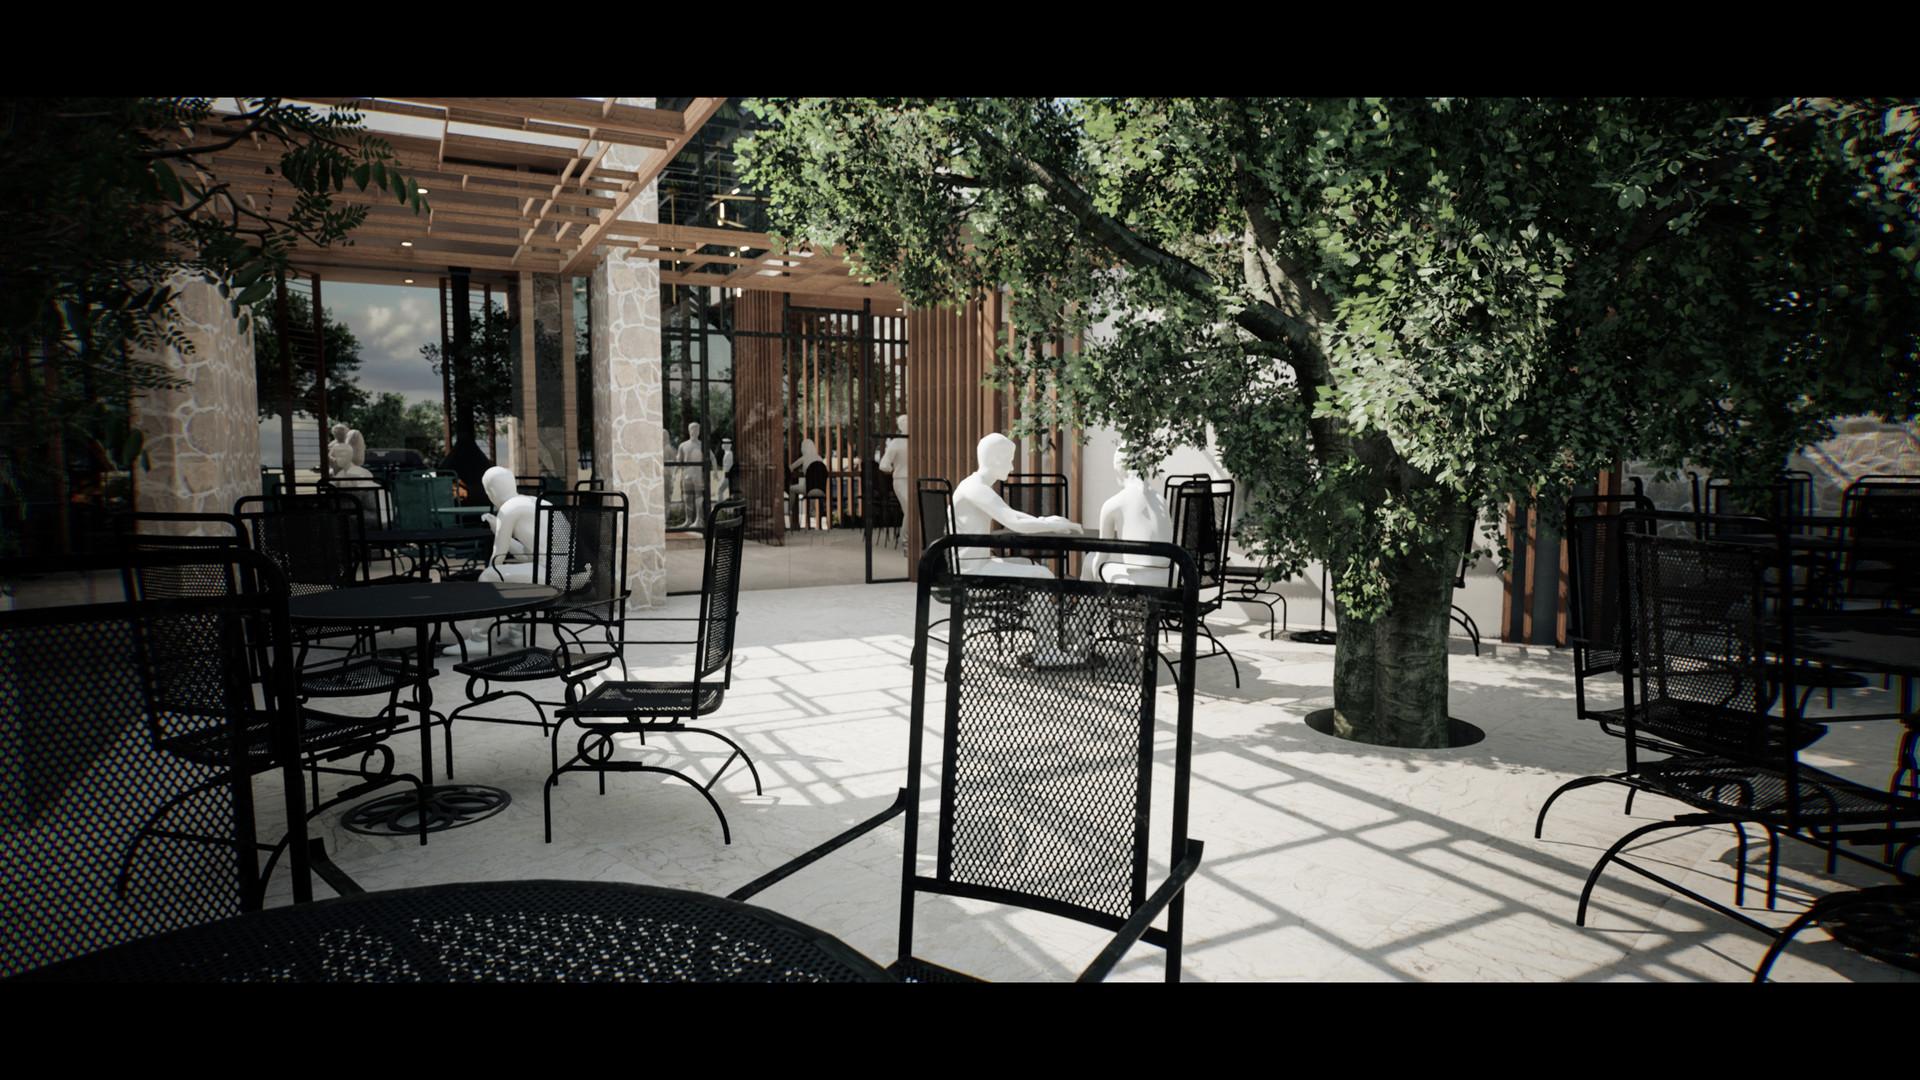 Central courtyard 1